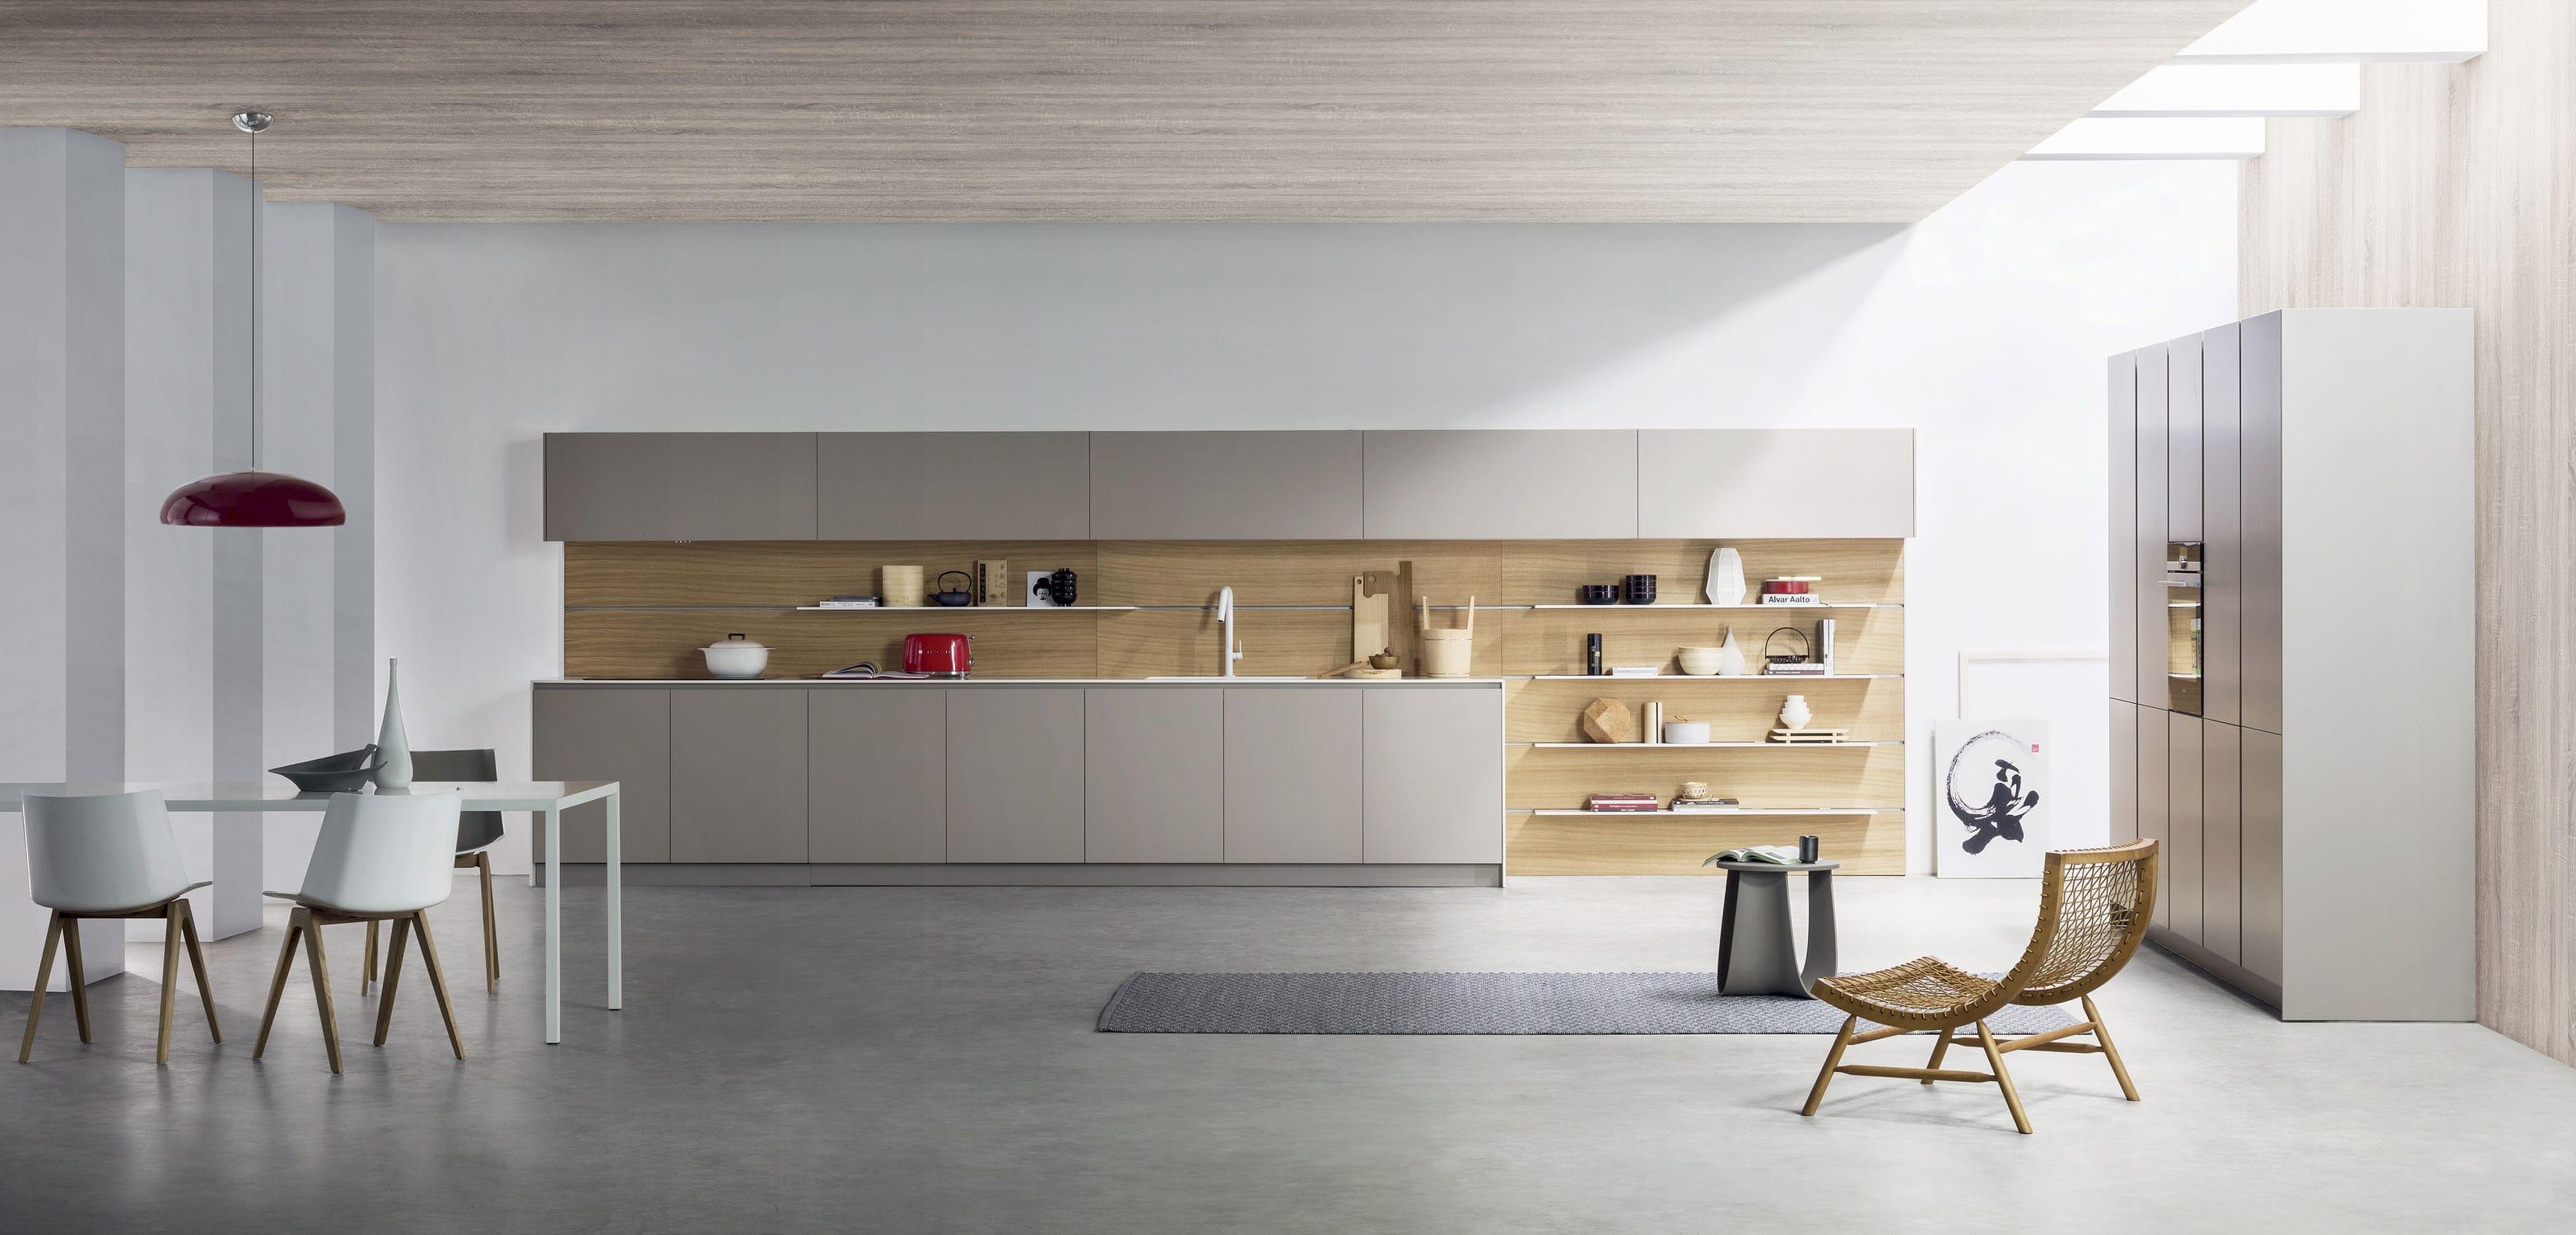 Moderne Küche / Edelstahl / Laminat / Kochinsel - K6 - TM Italia